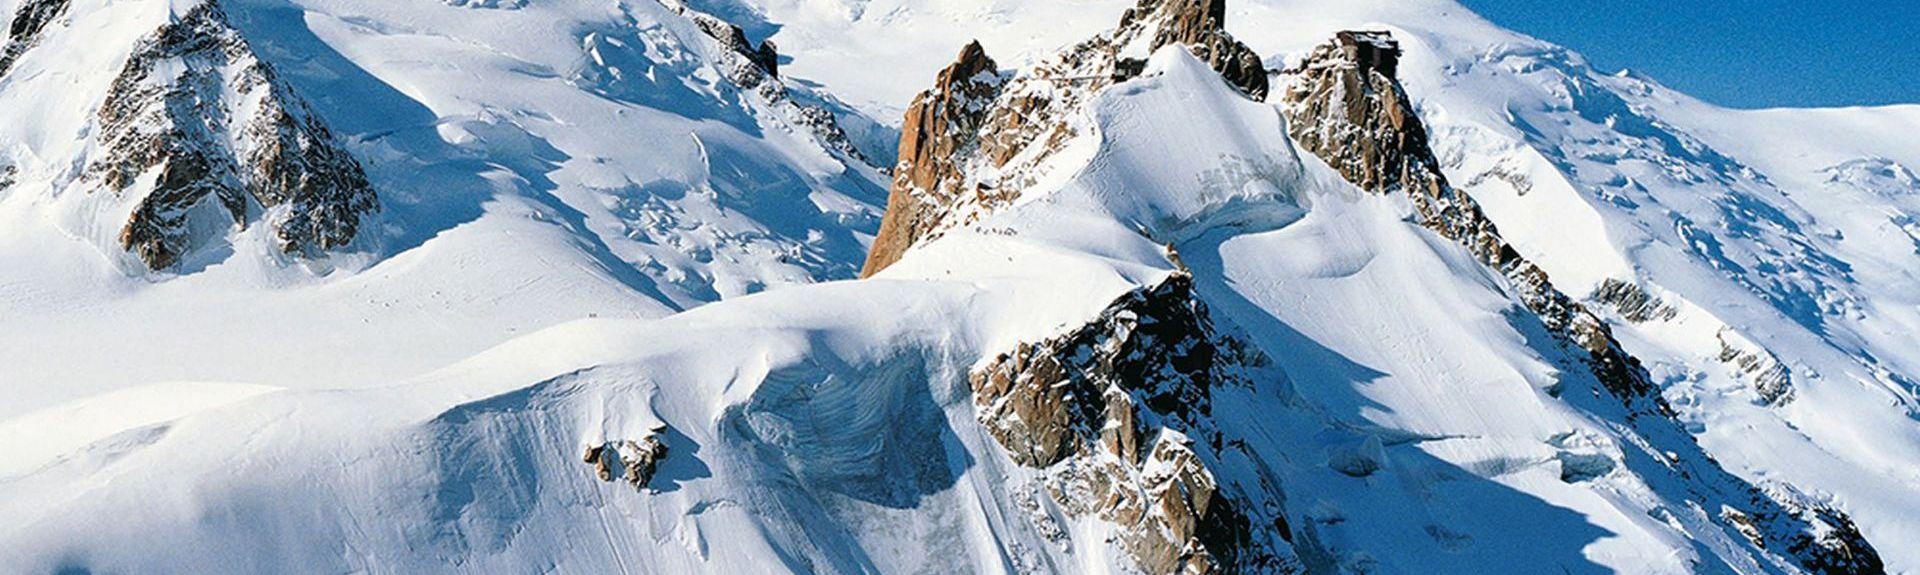 Les Bossons, Chamonix-Mont-Blanc, Ranska